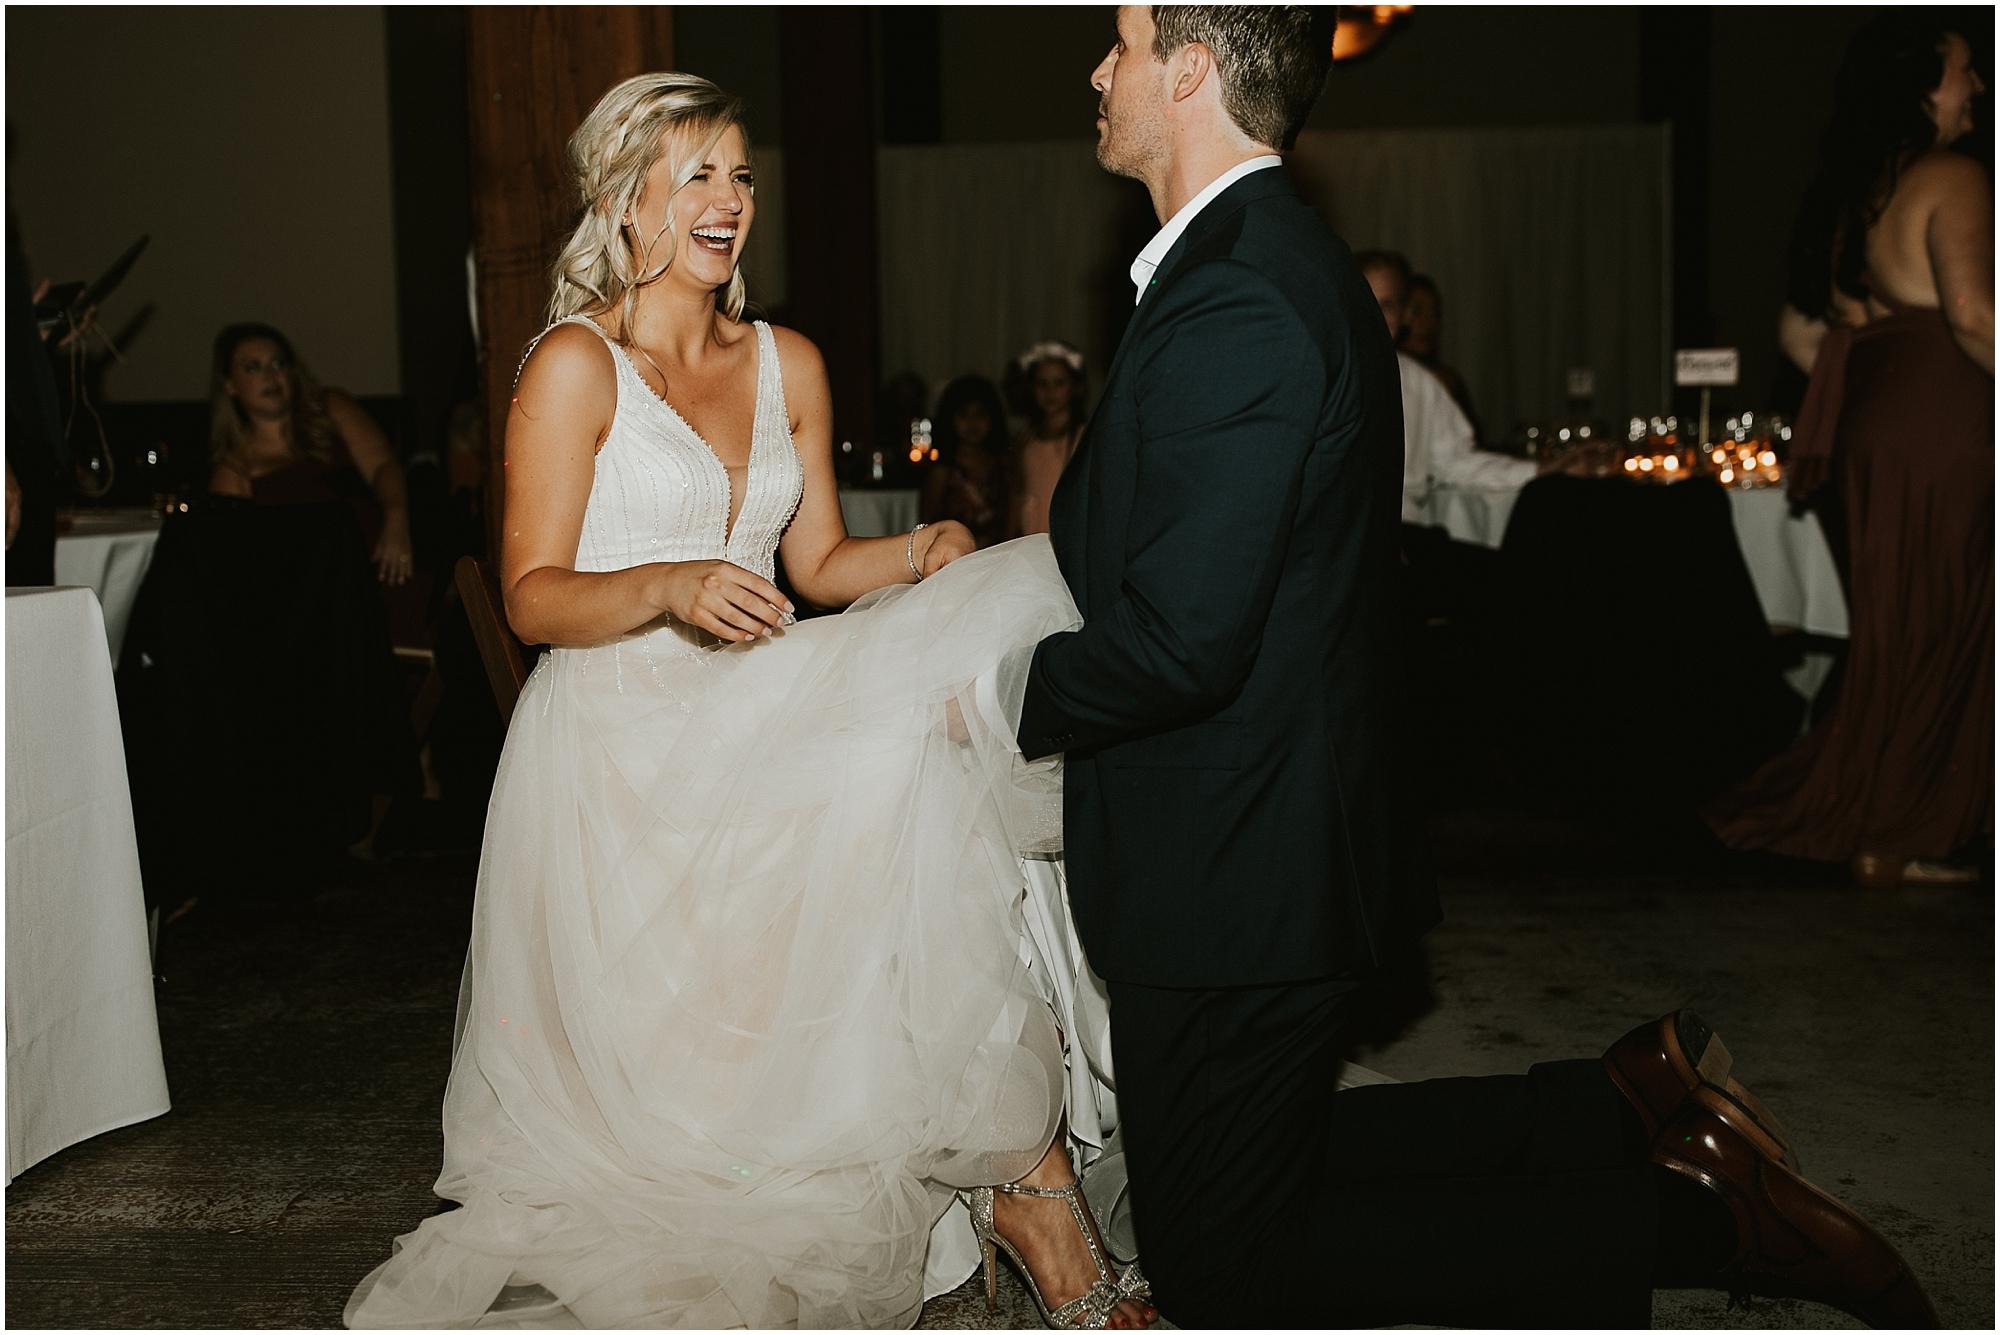 Chateau Rive Spokane Wedding Cassie Trottier Photography1173.jpg